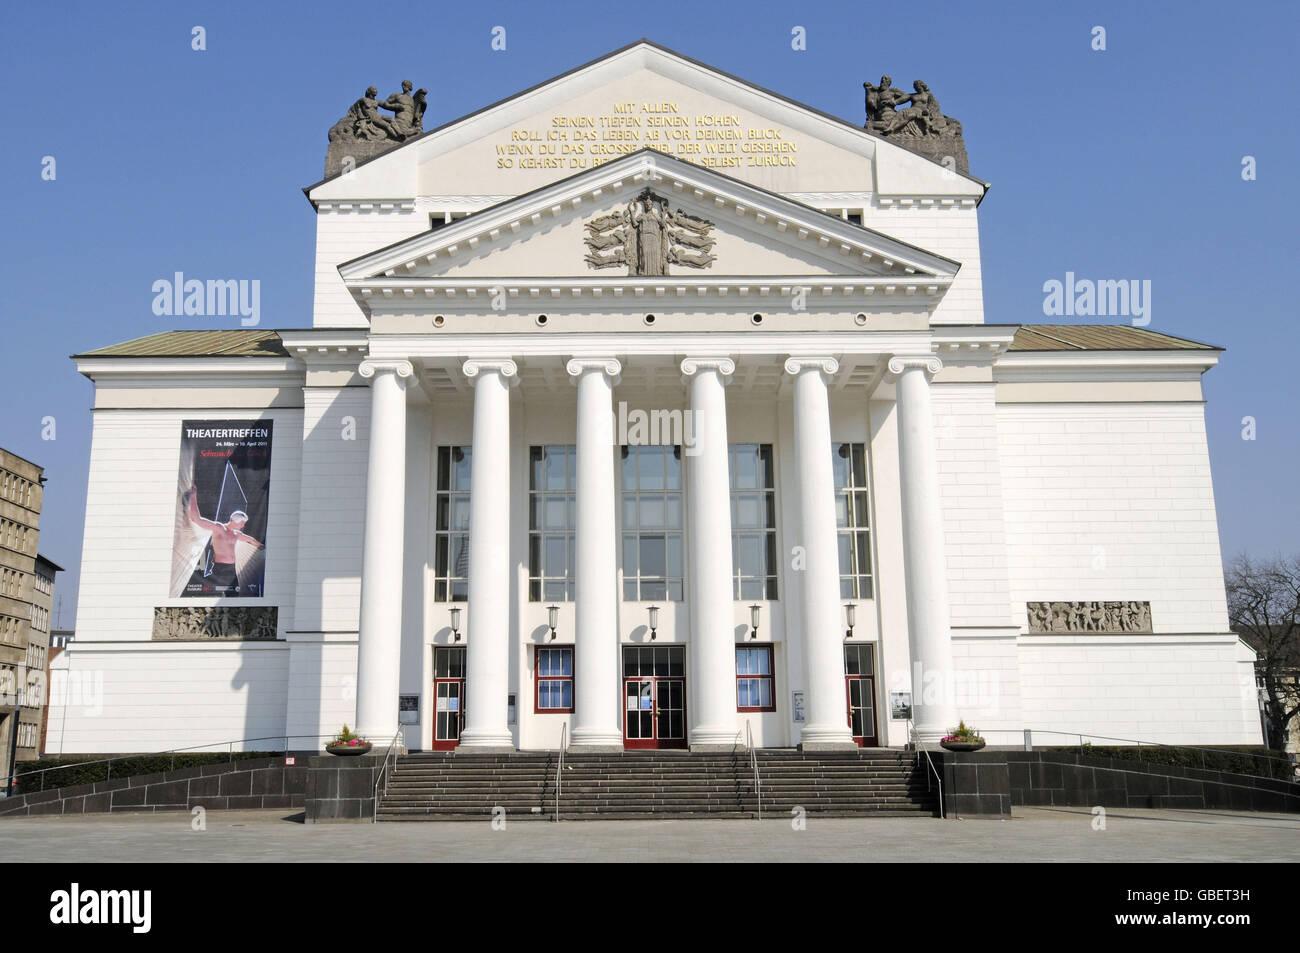 Theatre, Duisburg, North Rhine-Westphalia, Germany - Stock Image